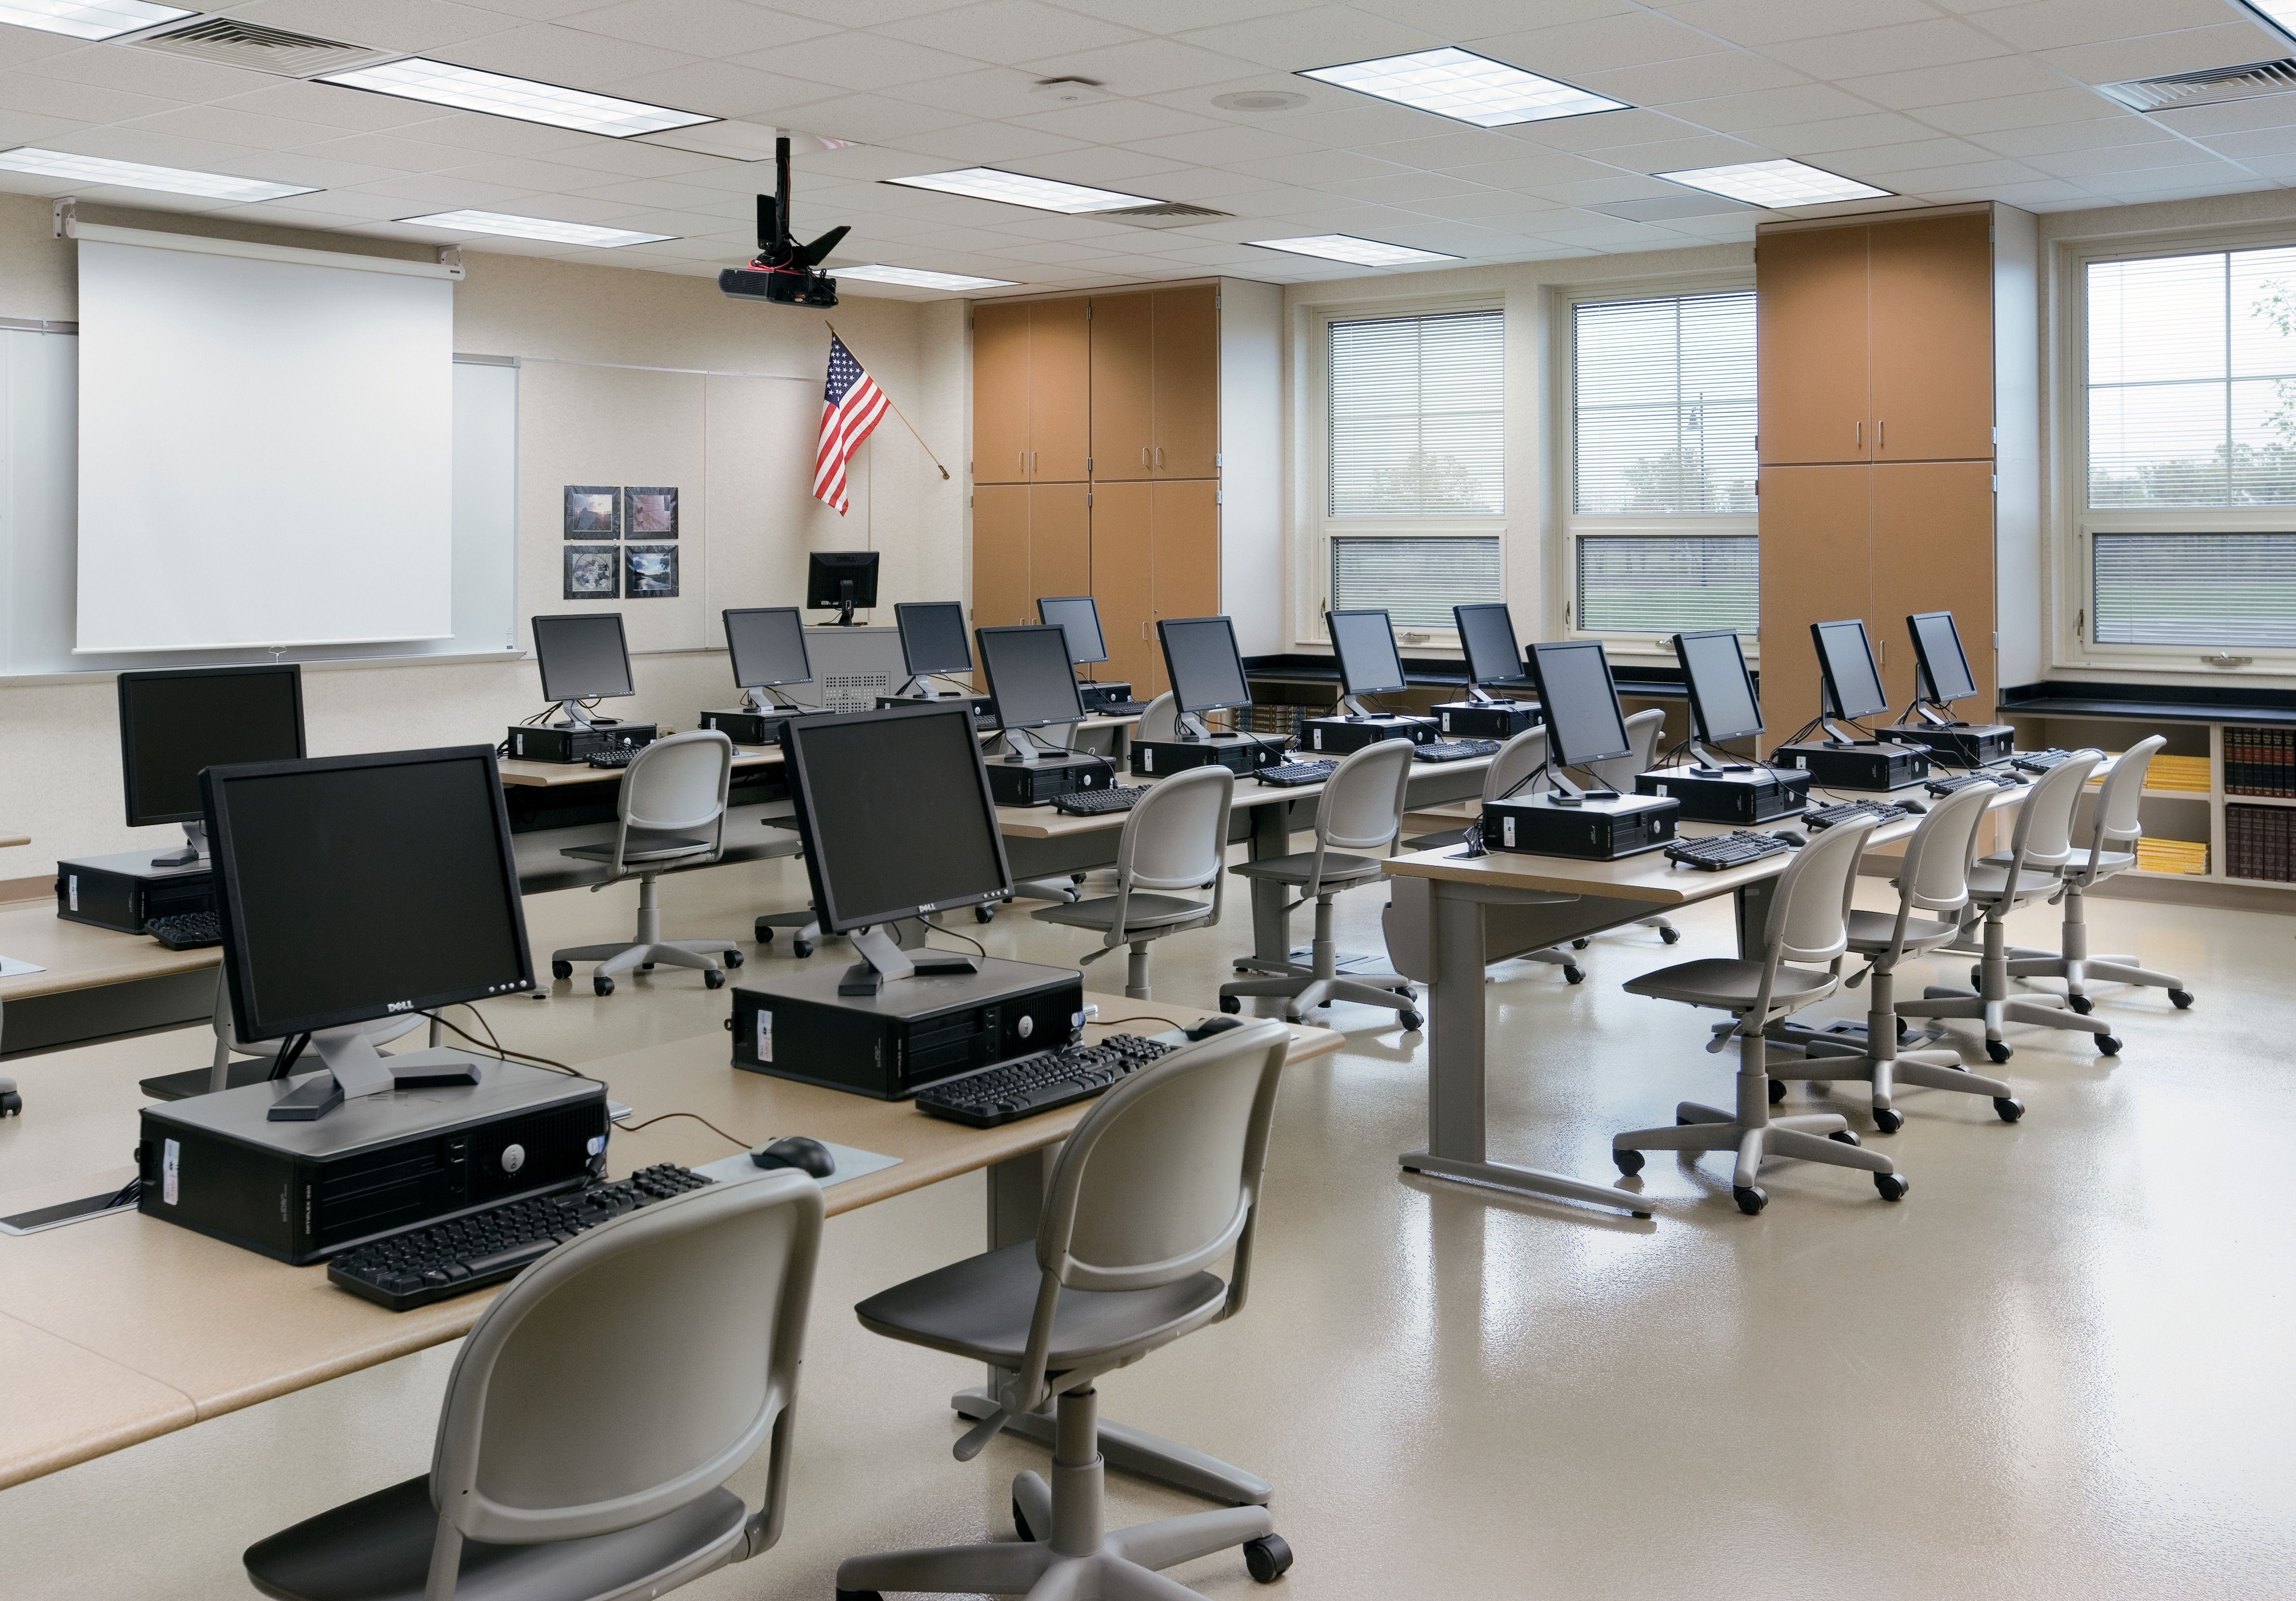 College Computer Lab Interior Design Ideas Stunning